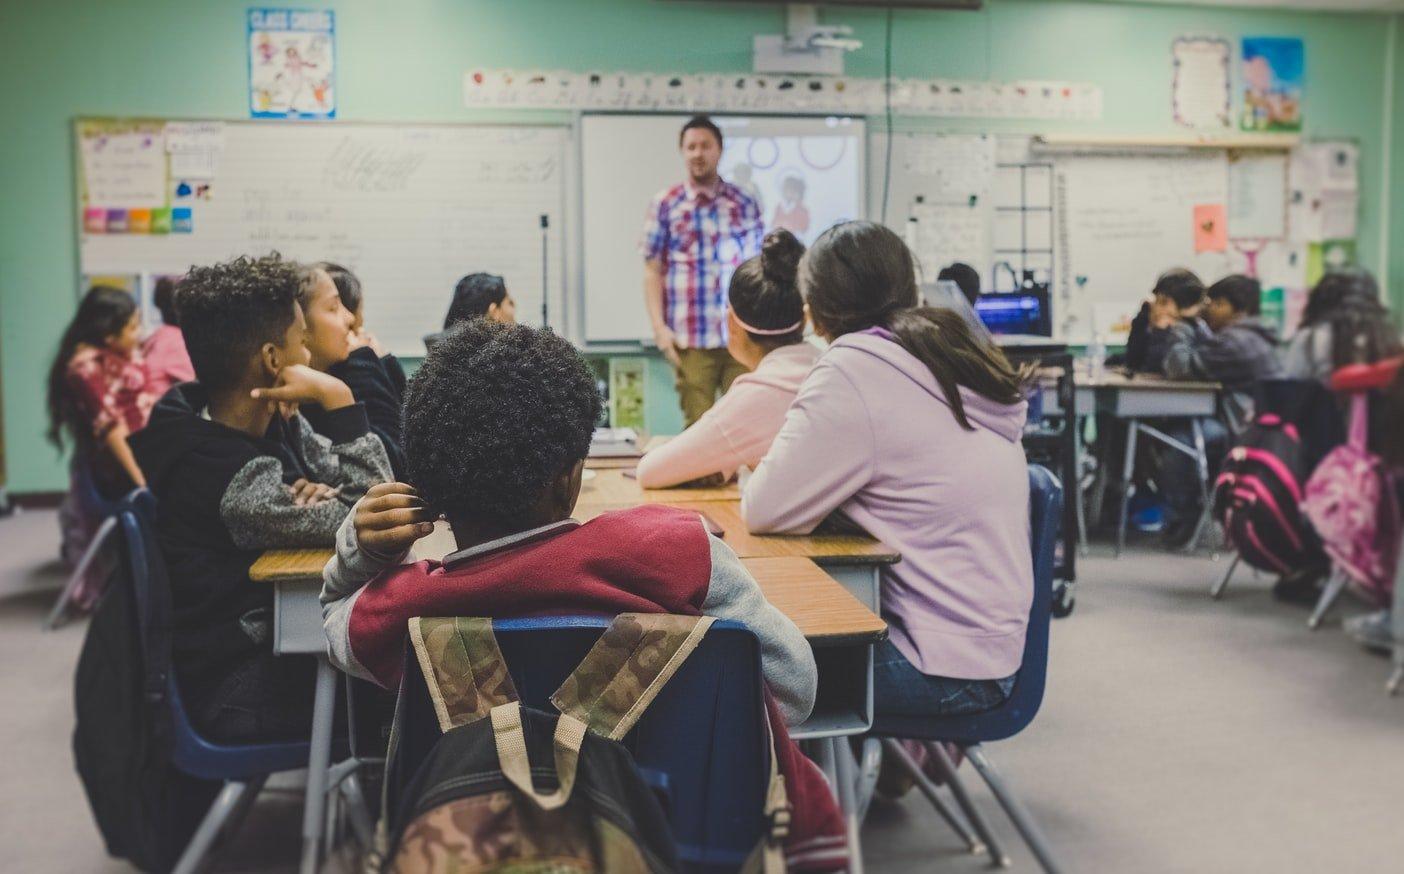 kids in classroom at school